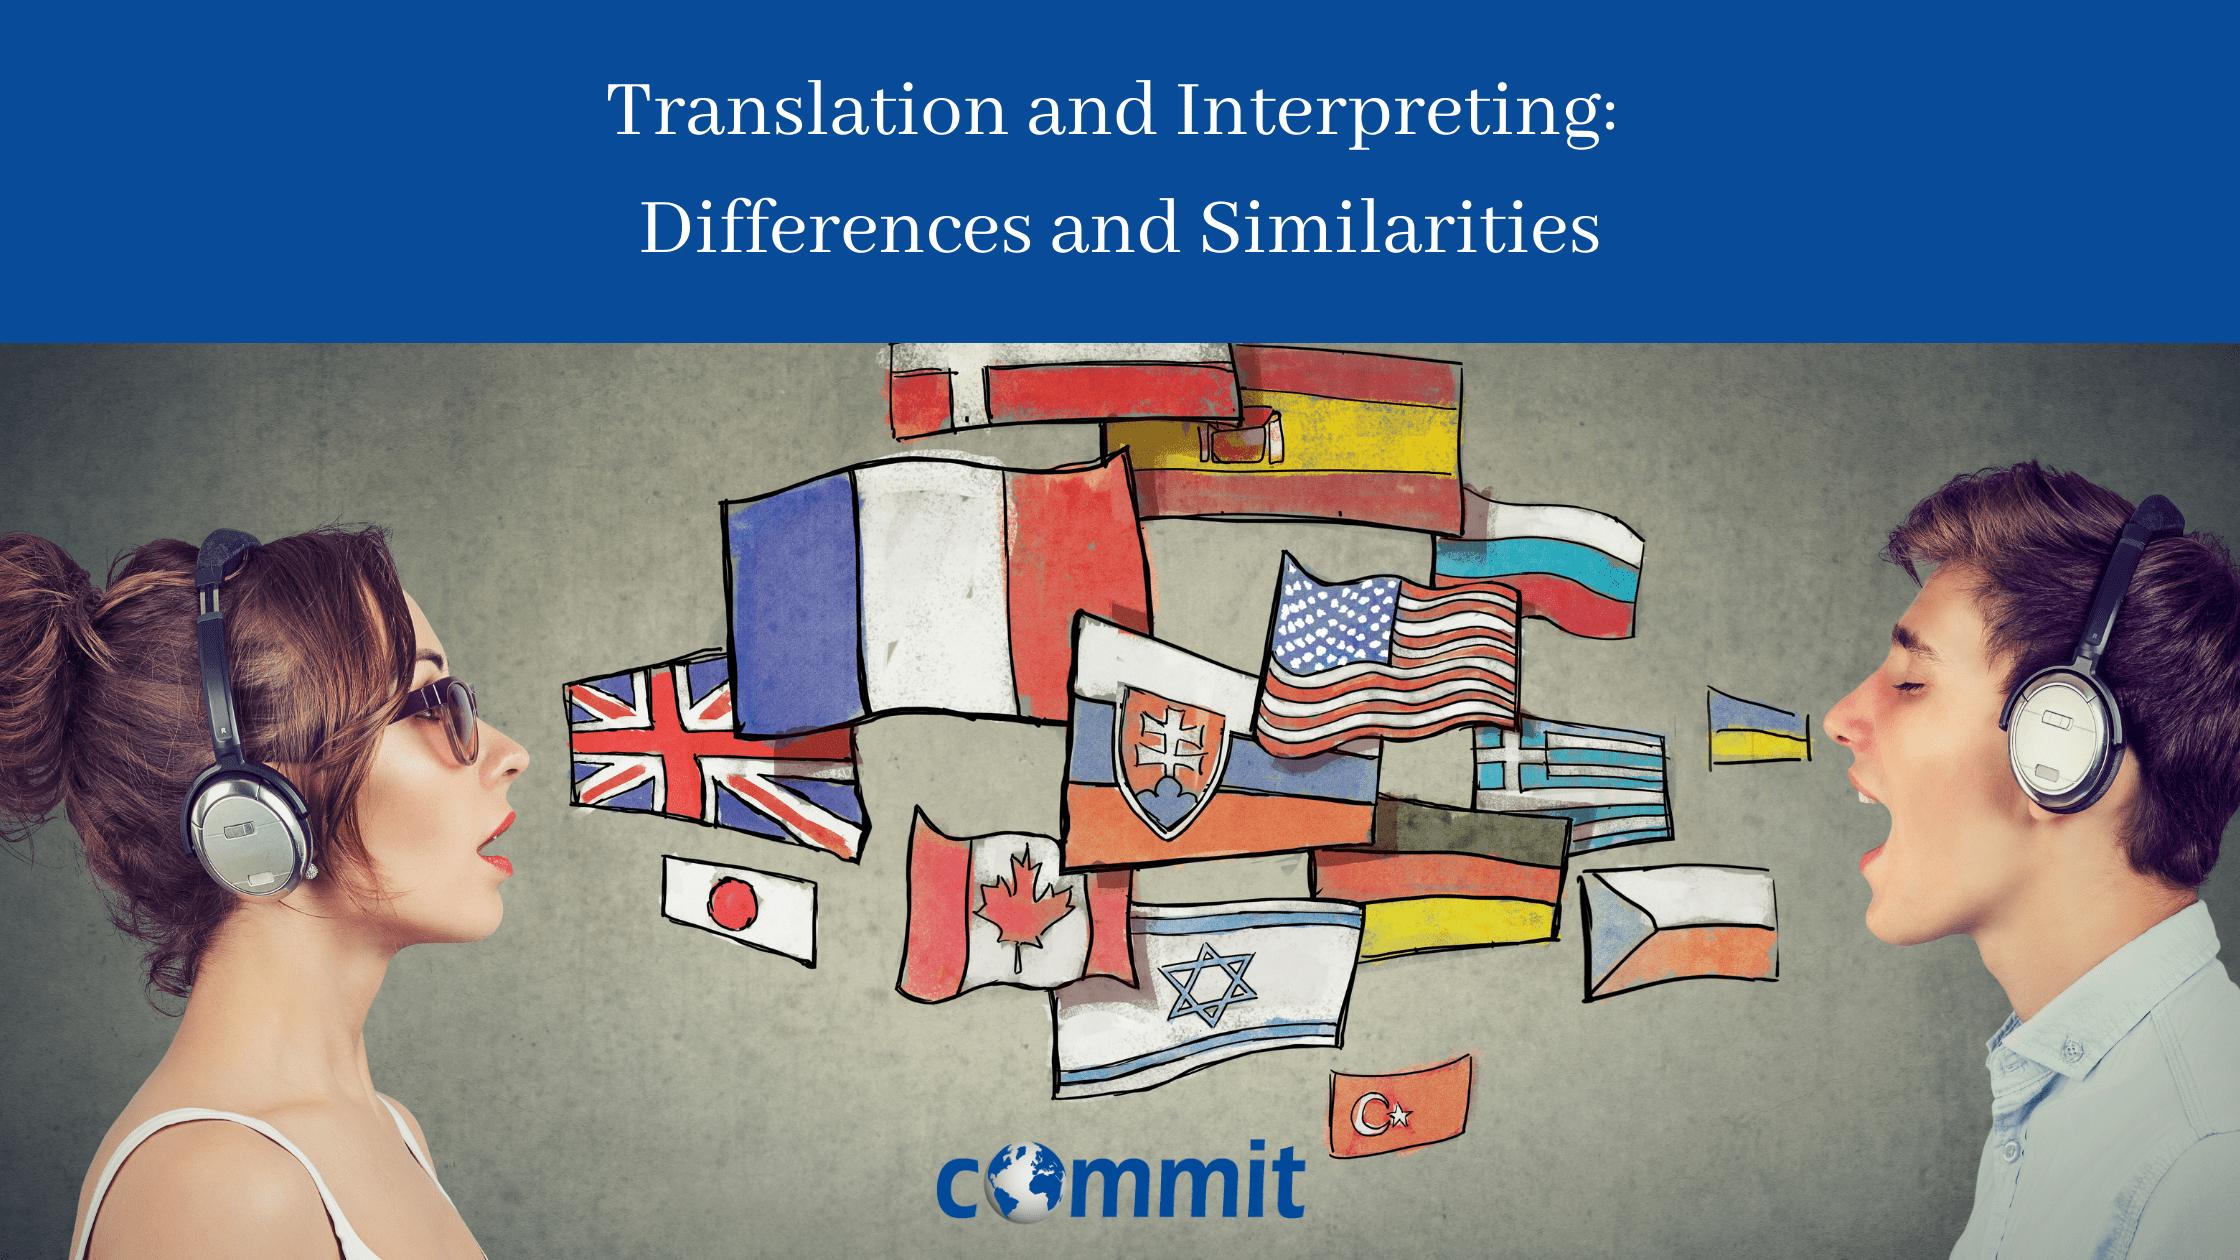 Translation & Interpreting: Differences & Similarities